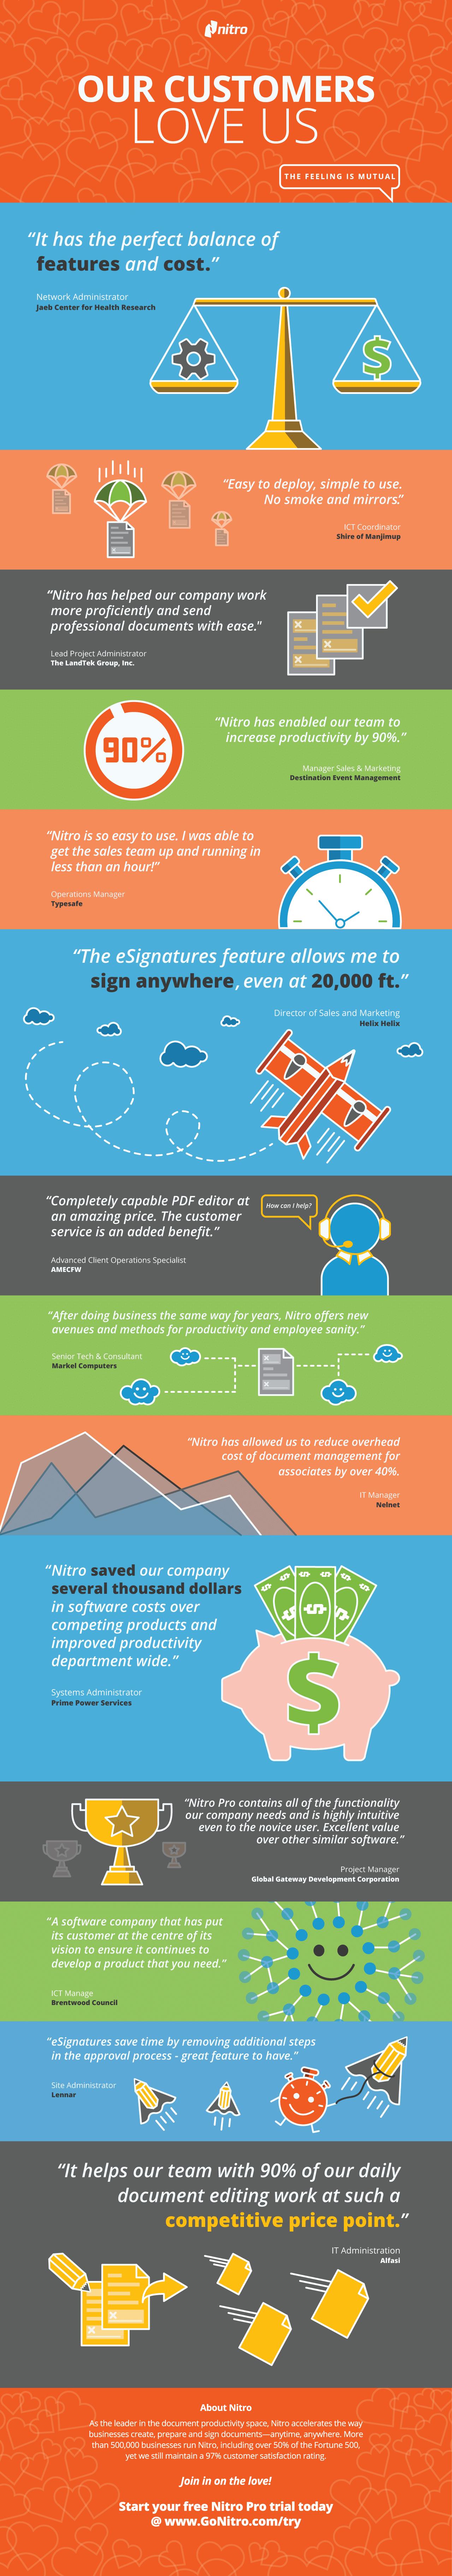 nitro pdf editor software reviews infographic